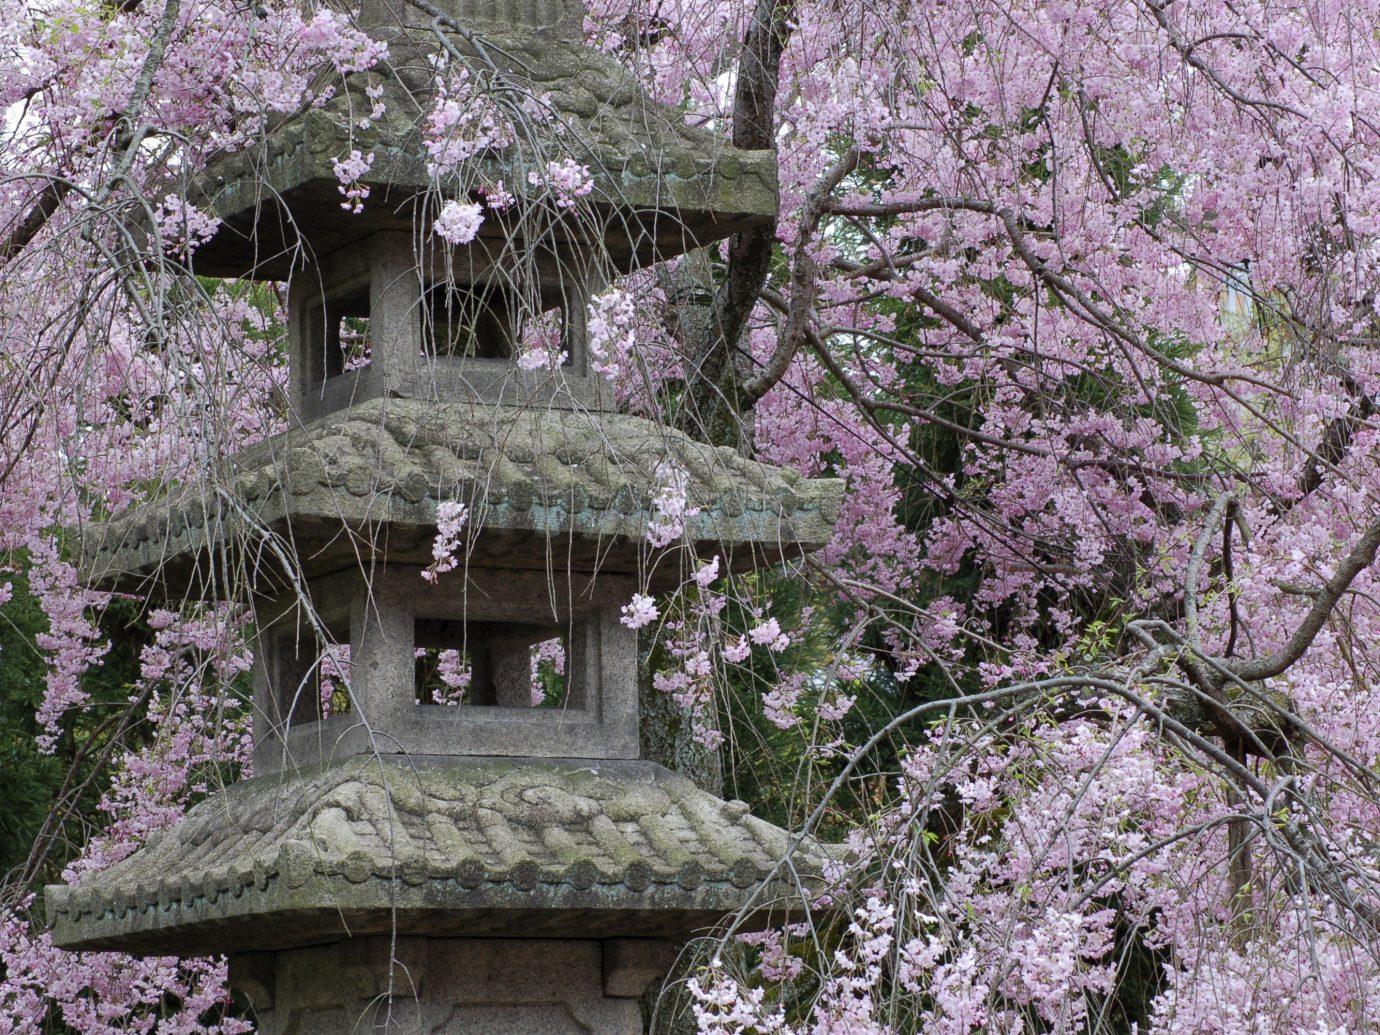 Arts + Culture Festivals + Events Offbeat Travel Tips tree outdoor flower plant cherry blossom flora botany blossom spring Garden stone shrine surrounded